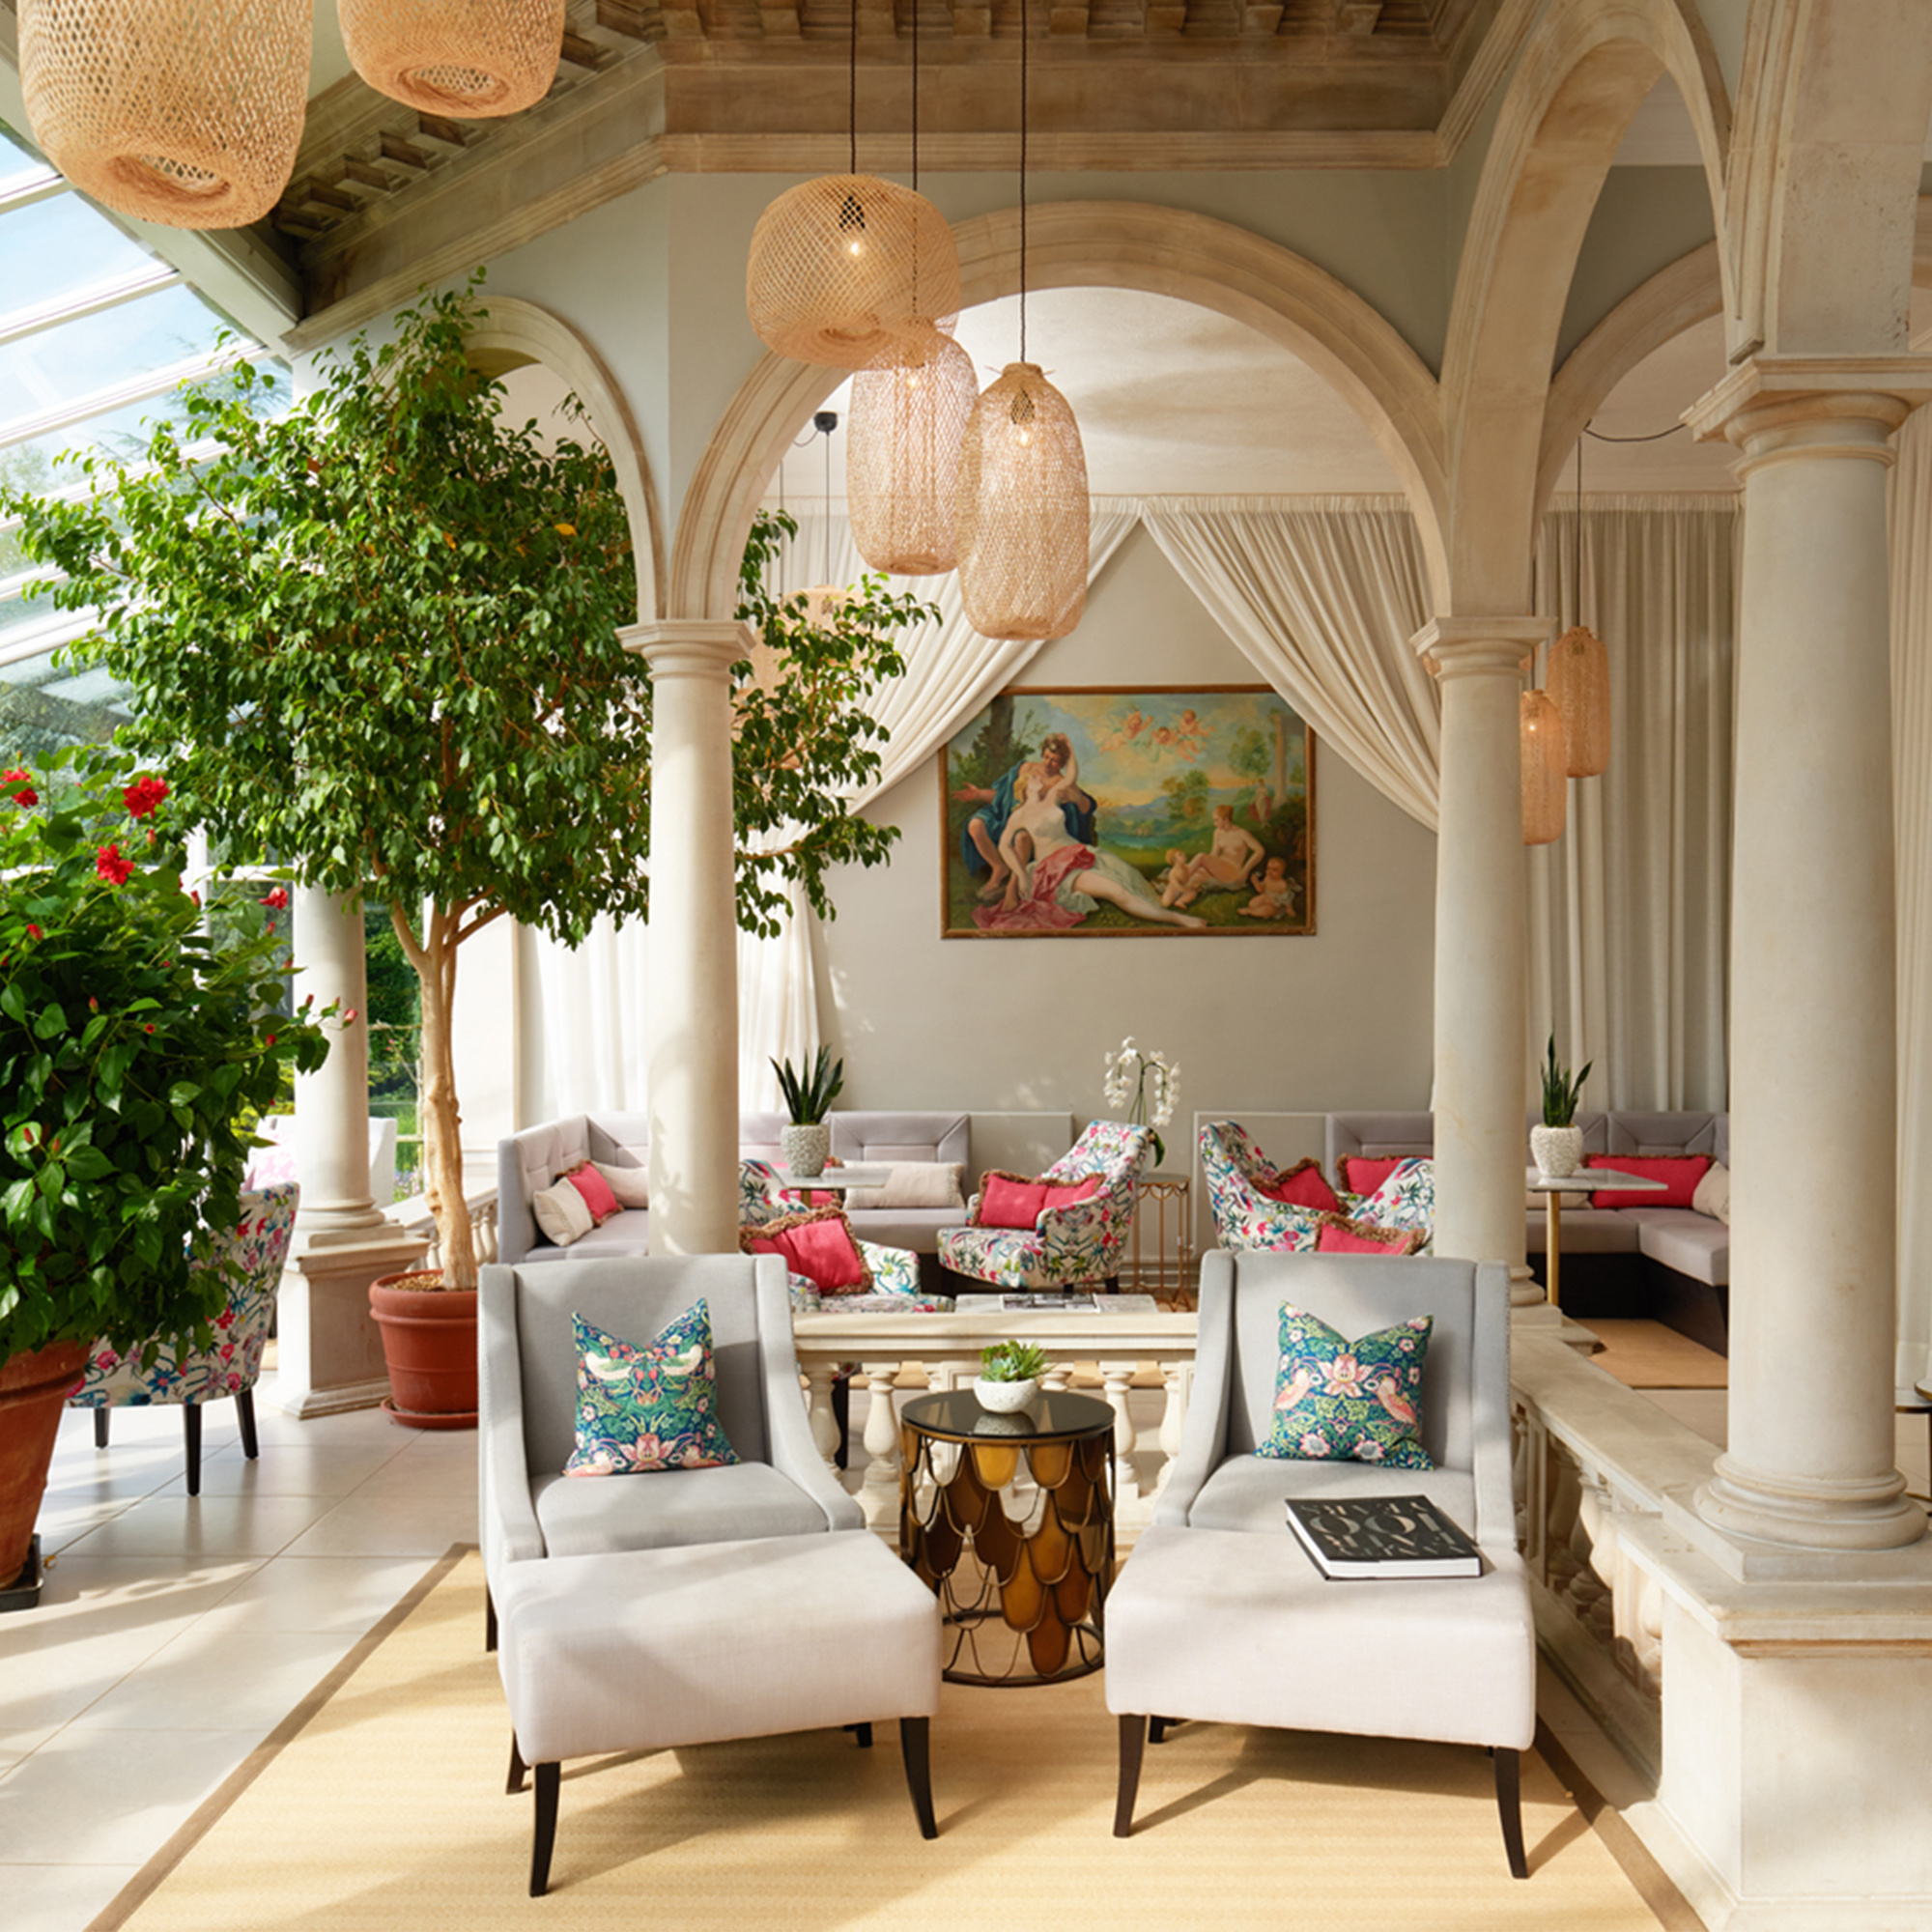 Champneys Luxury Spa Hotel, Henlow - 0